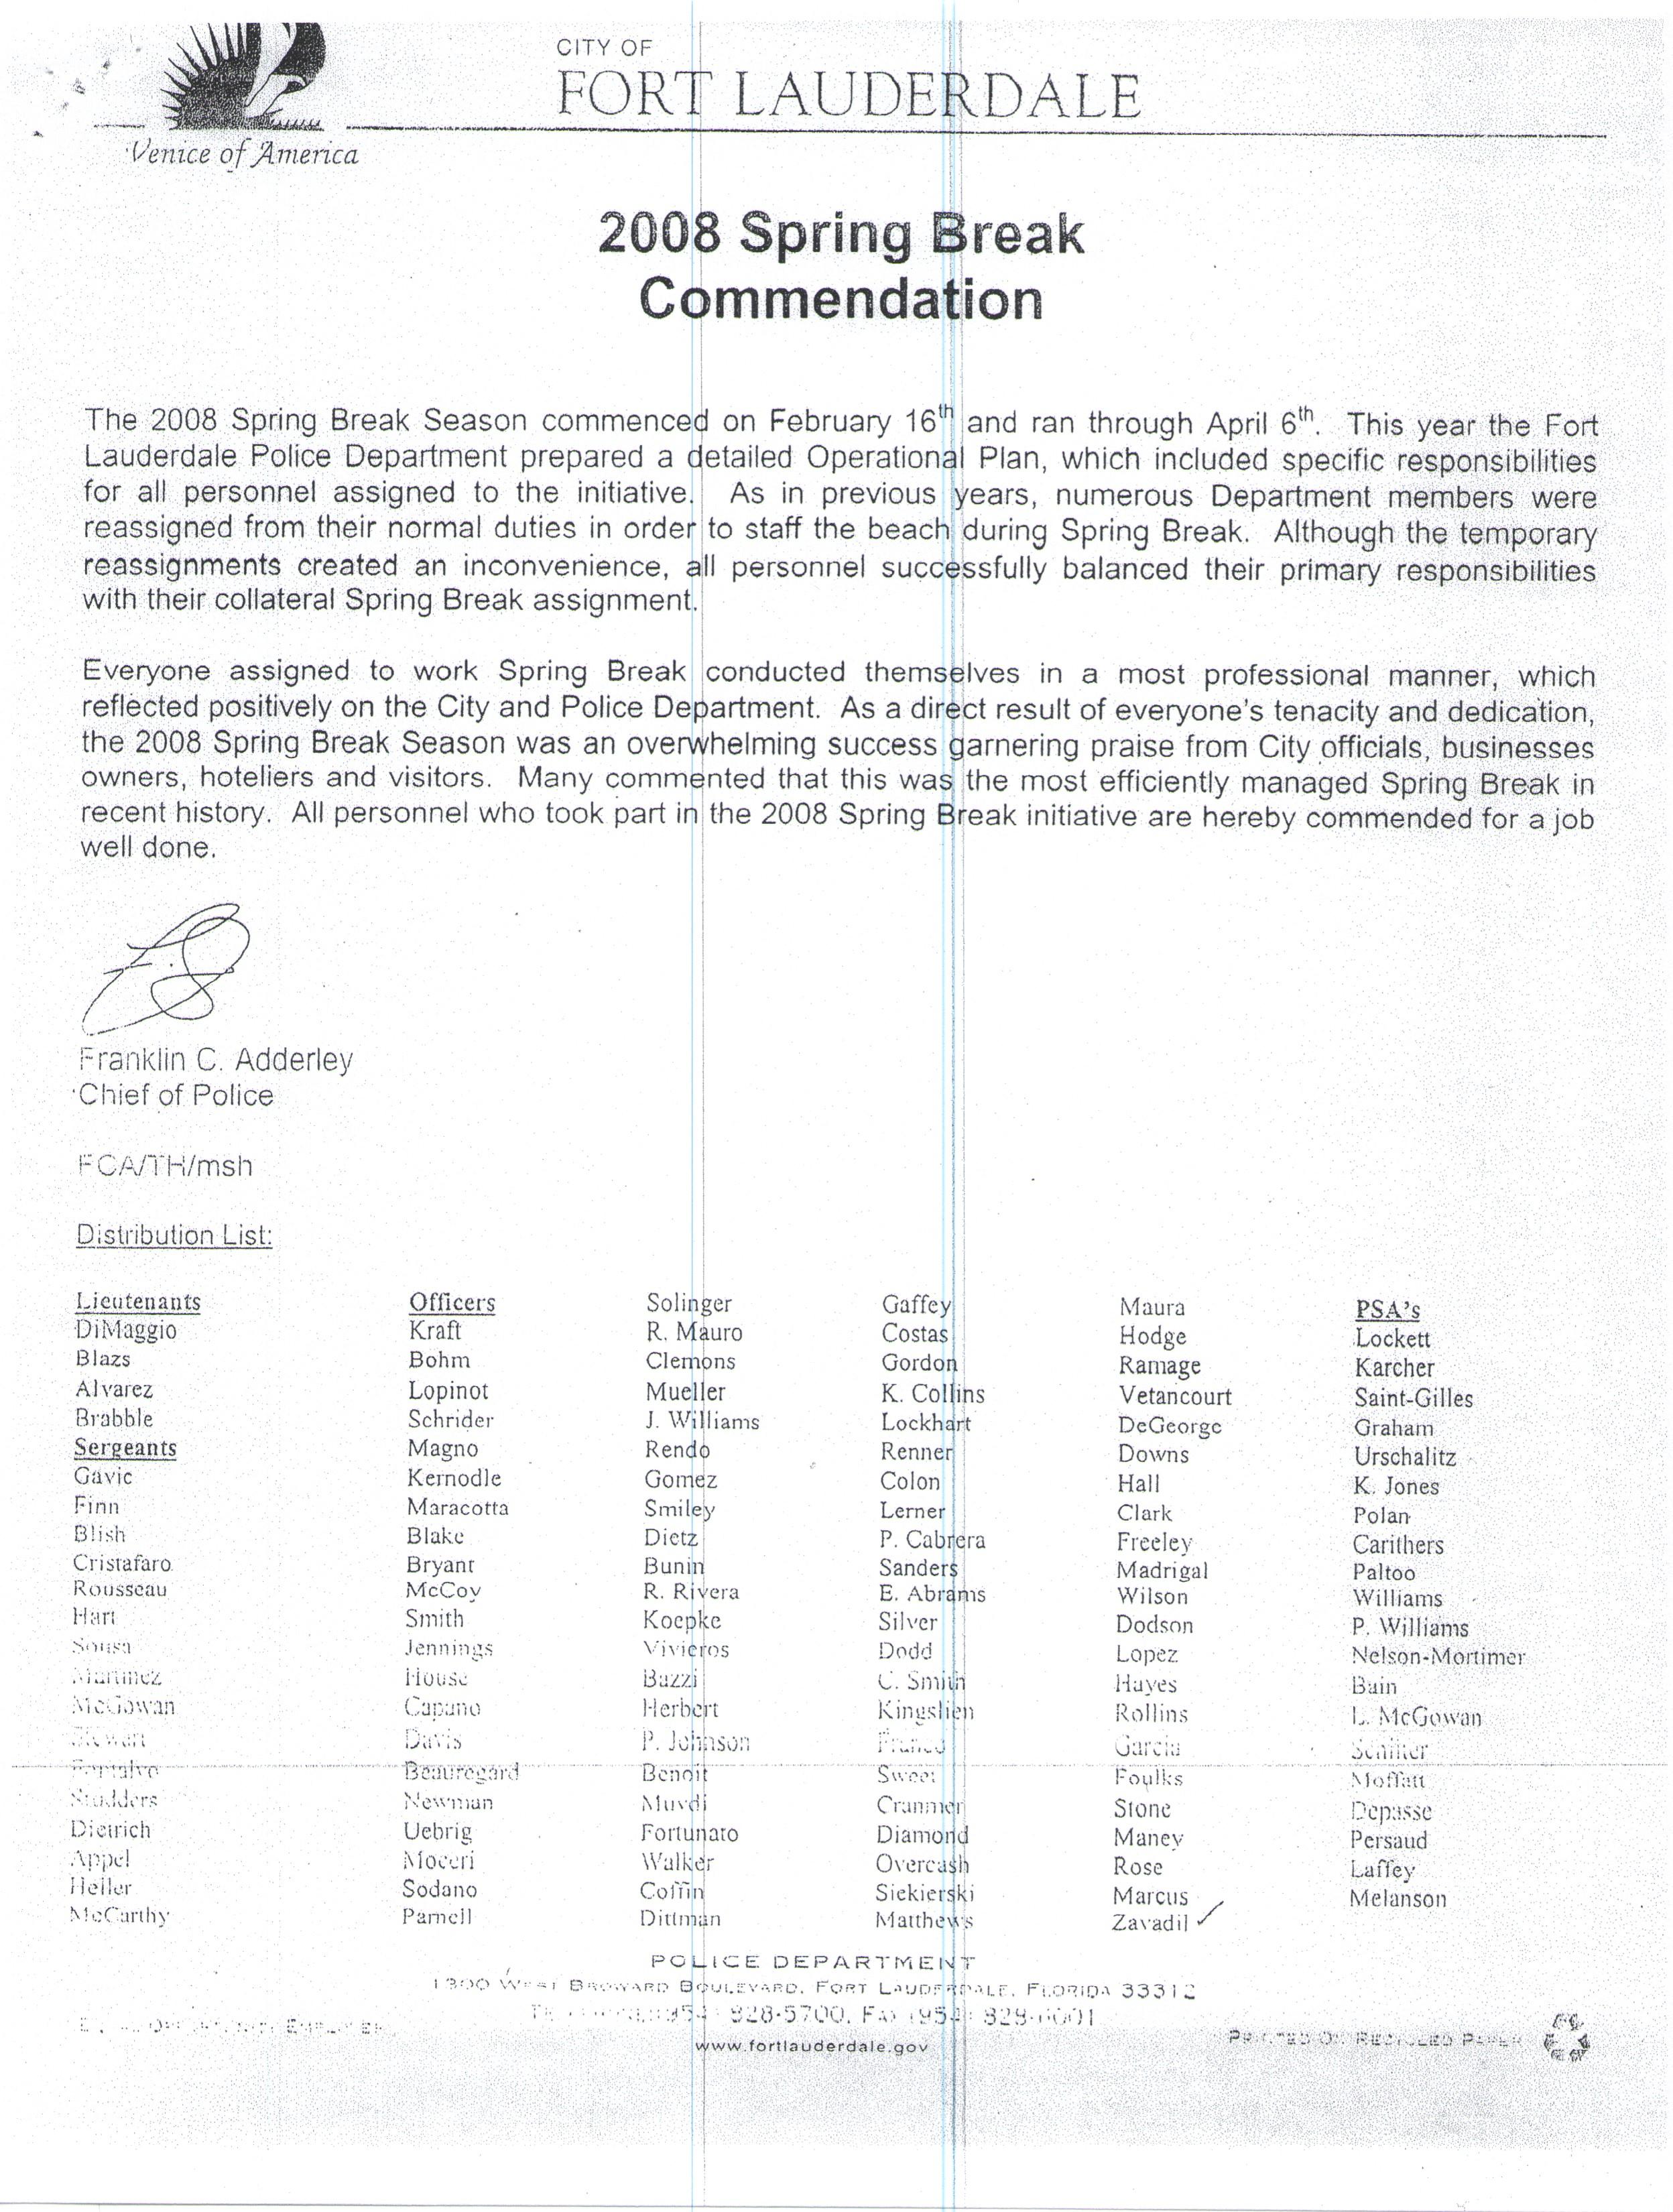 Department Commendation for Assistance during Spring Break.jpg